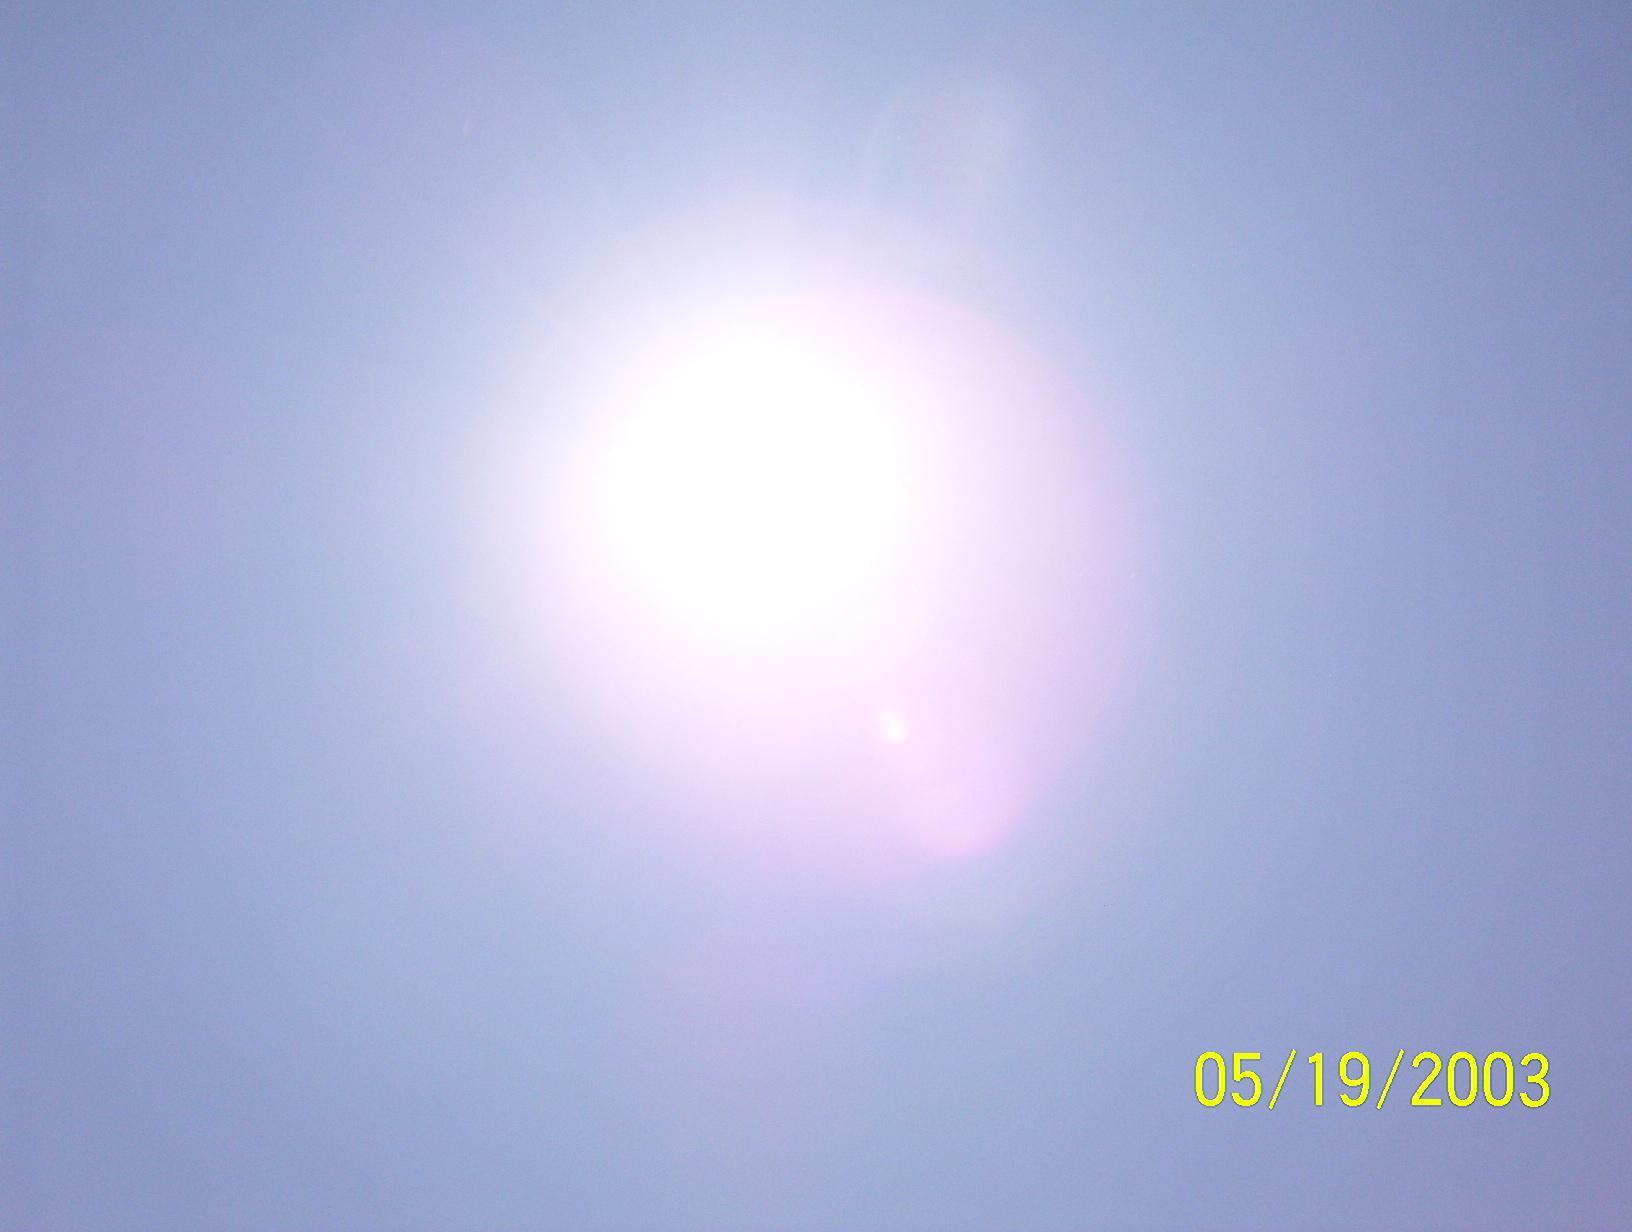 noon solar astronomy - photo #25